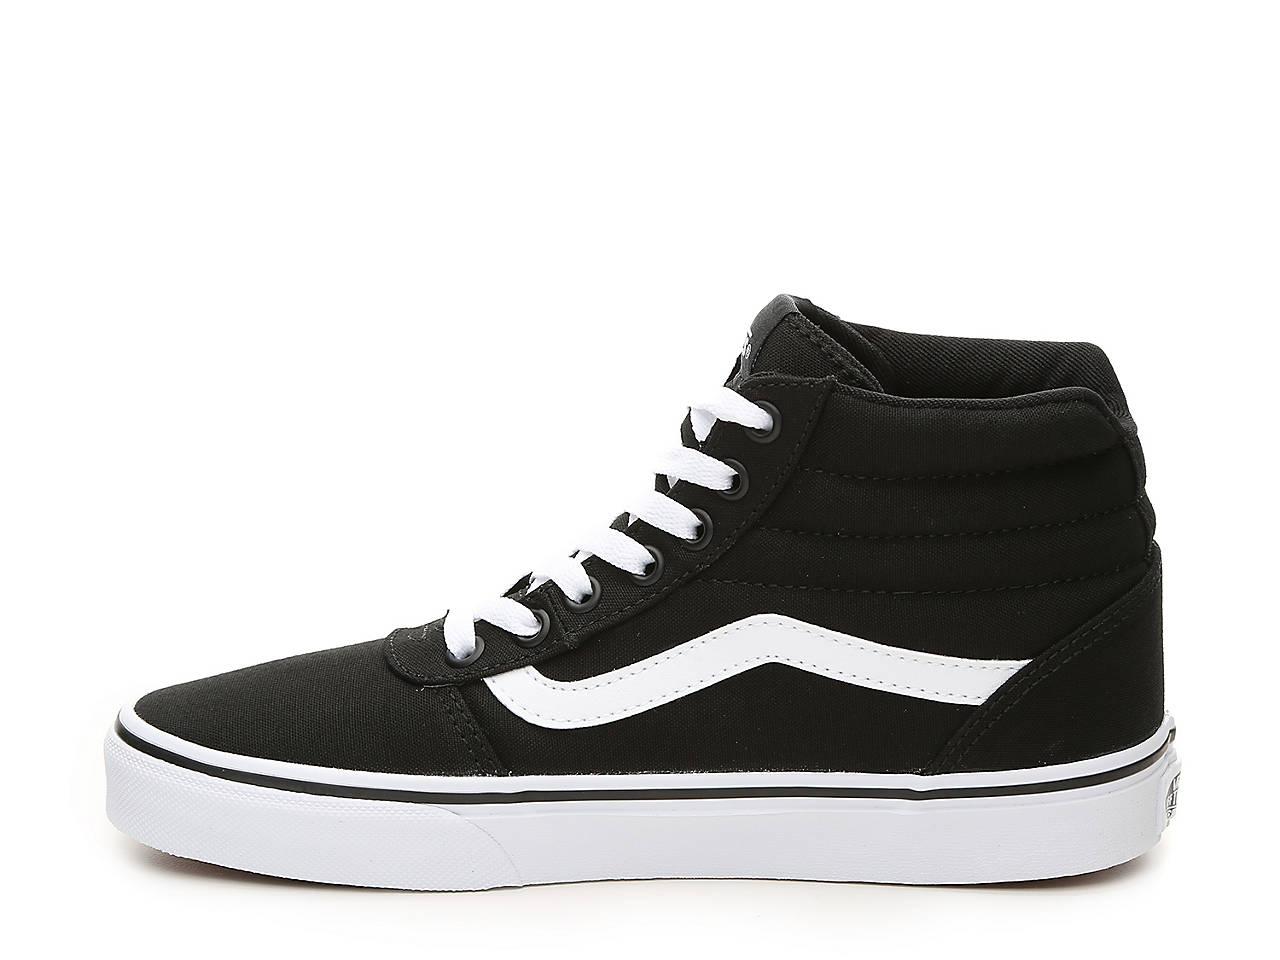 d6e72bfd5b5 Vans Ward High-Top Sneaker - Women s Women s Shoes